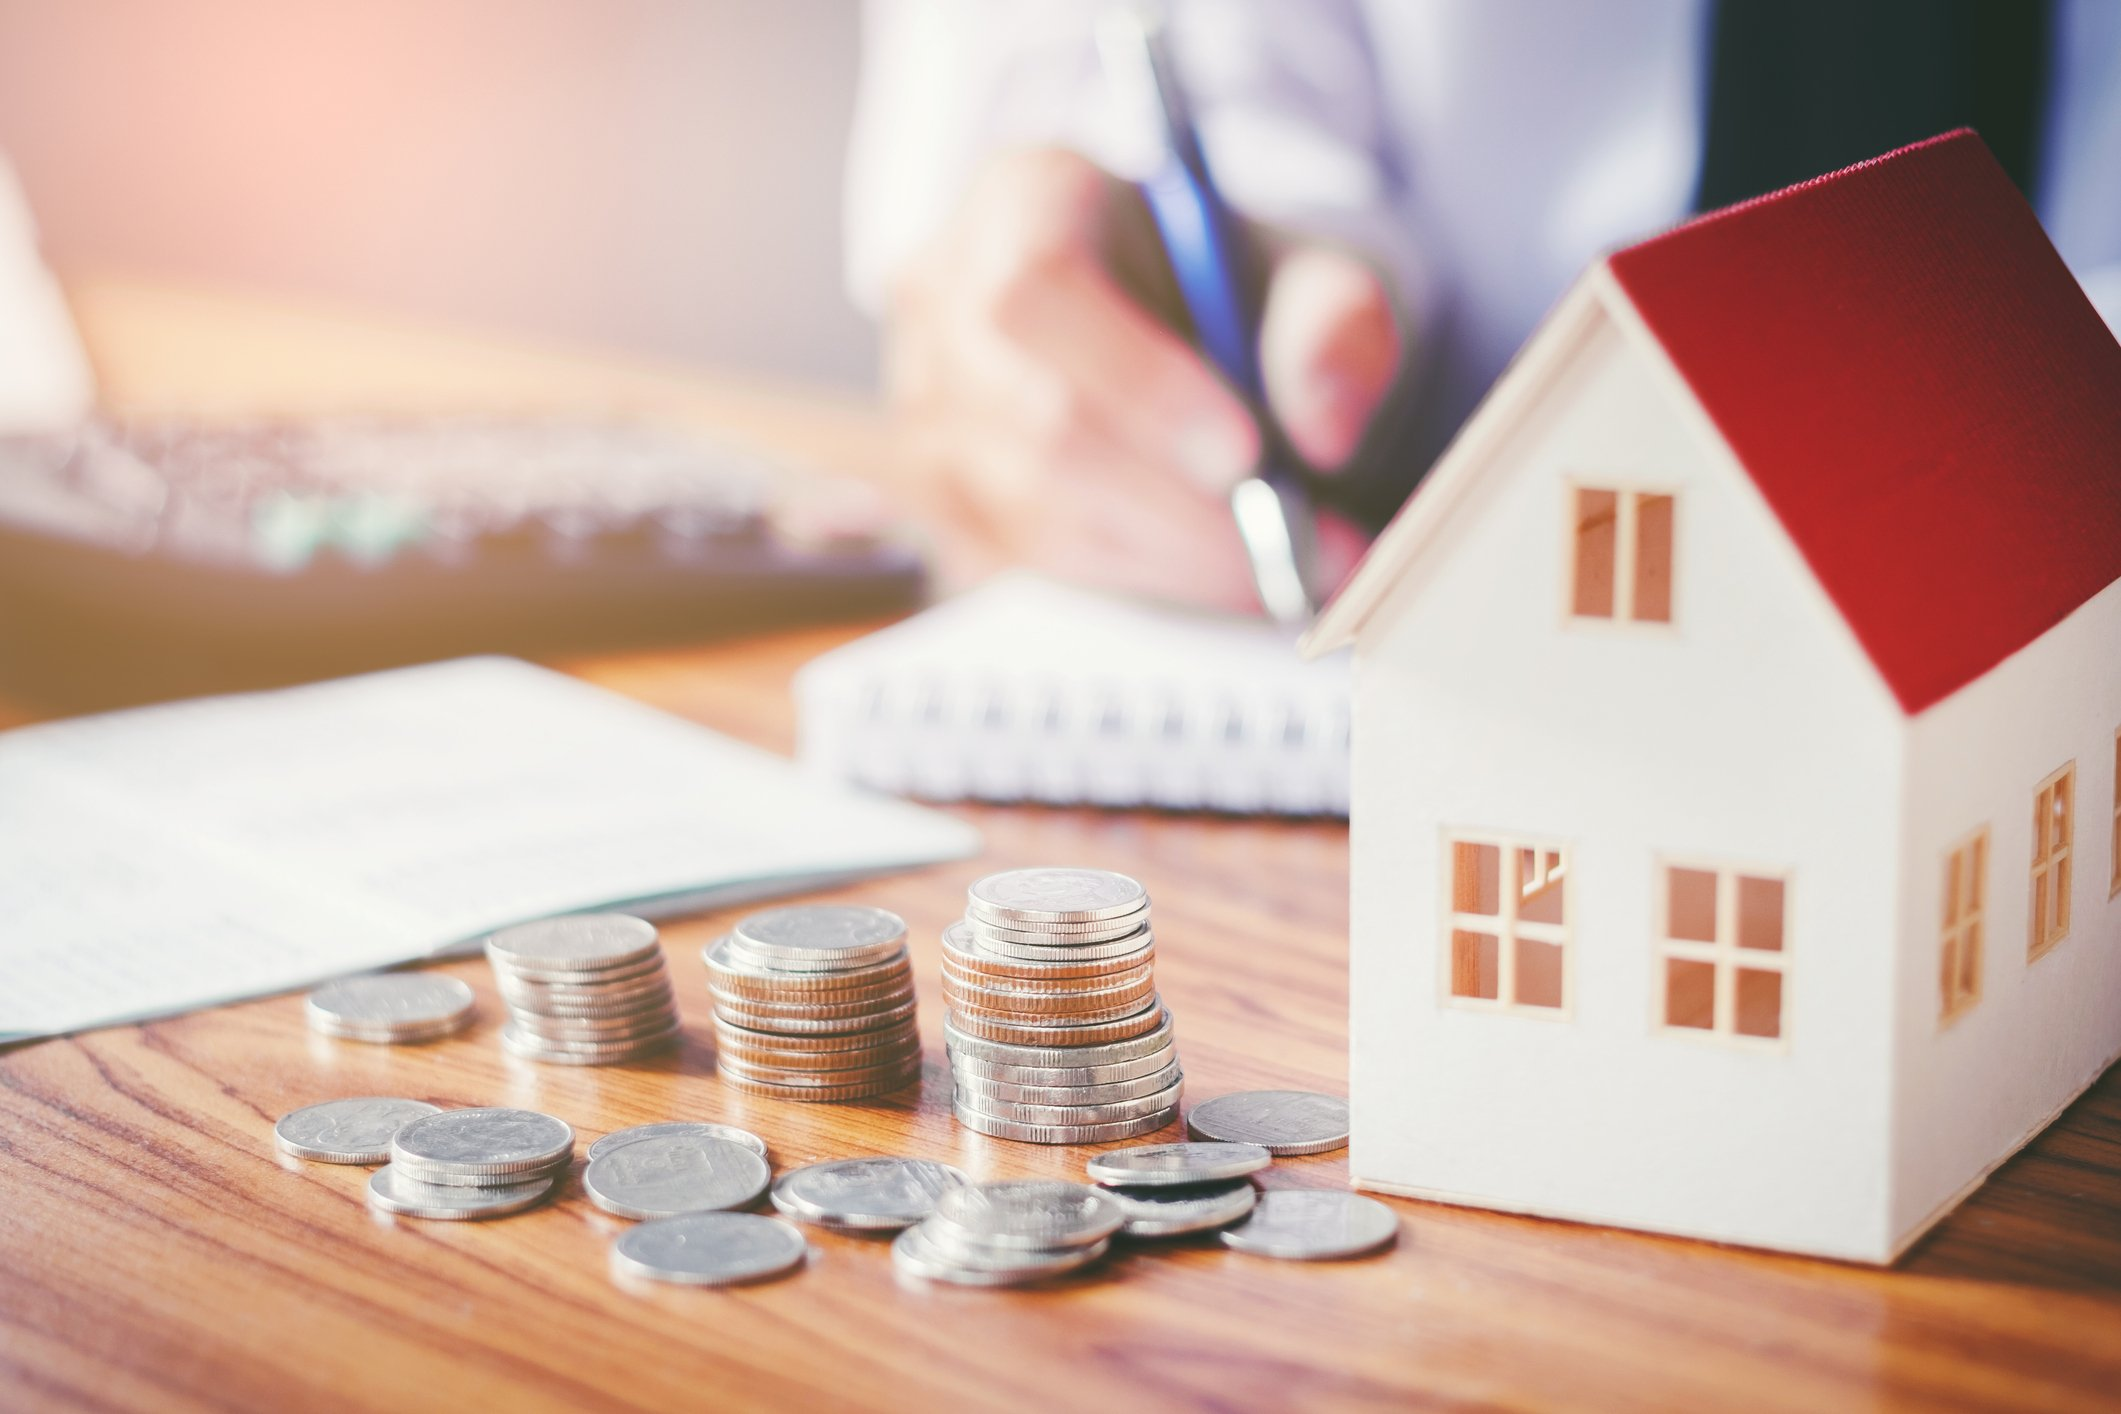 huizen sparen